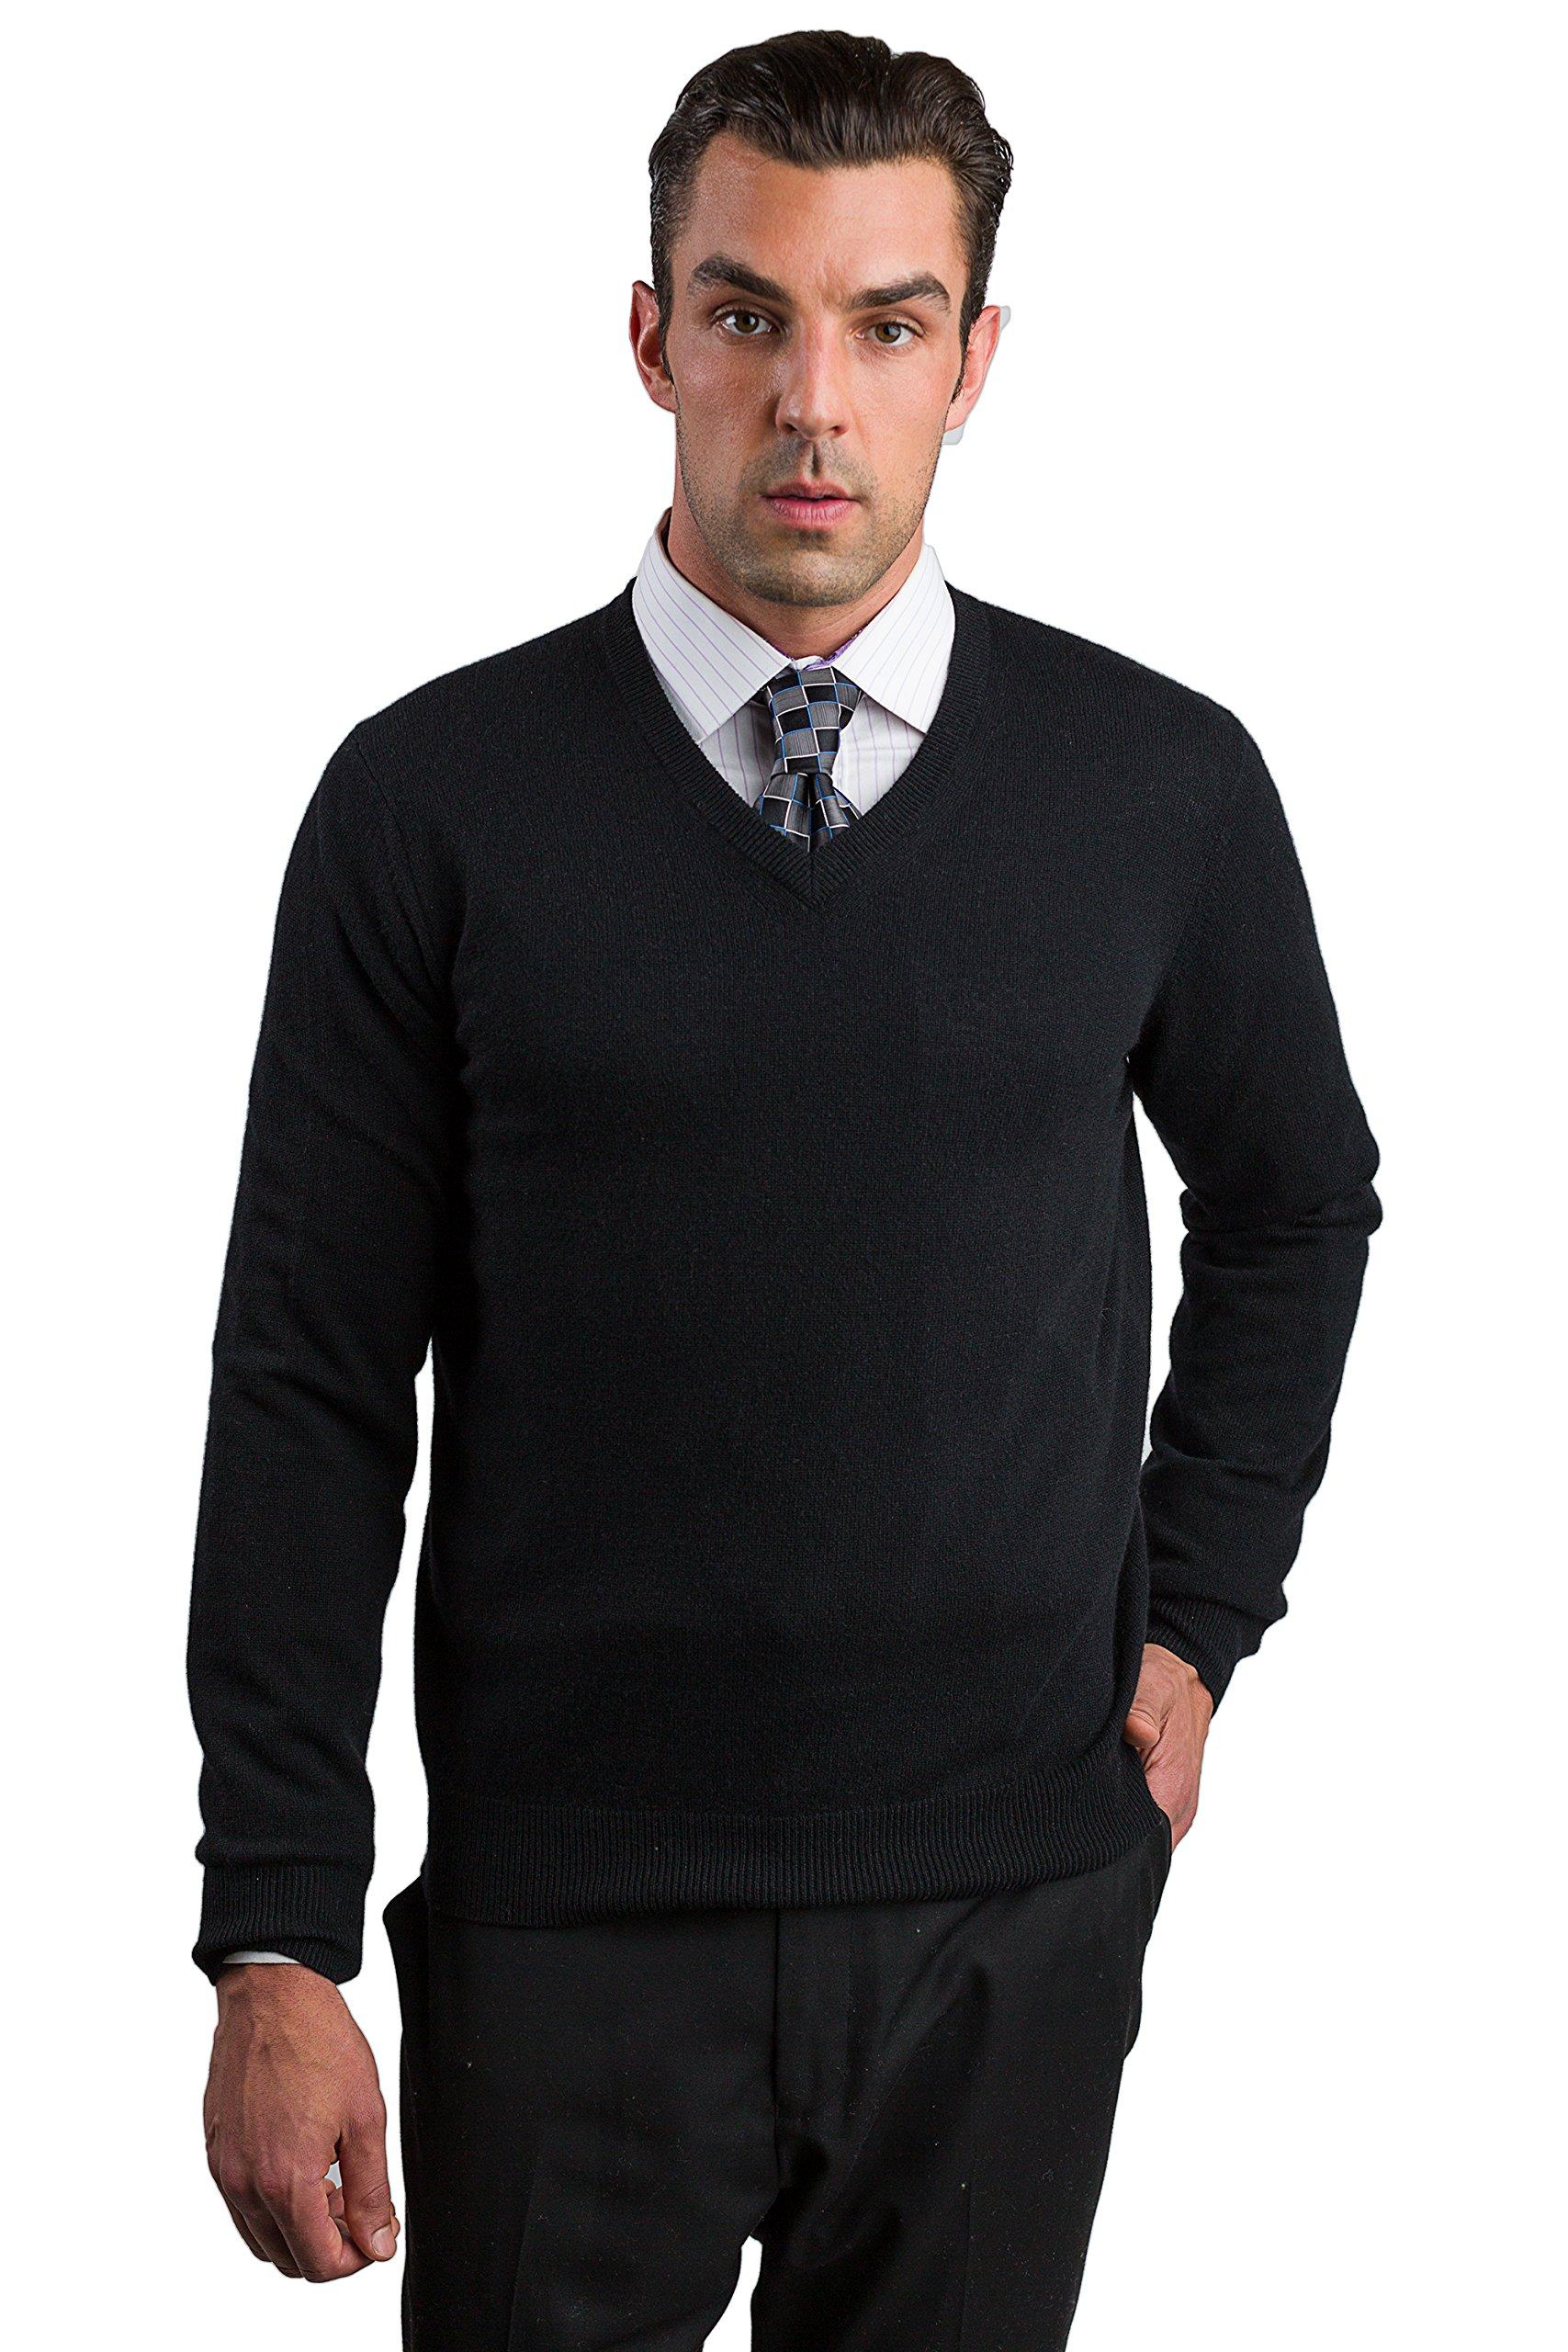 JENNIE LIU Men's Cashmere Long Sleeve V Neck Sweater, Black, X-Large